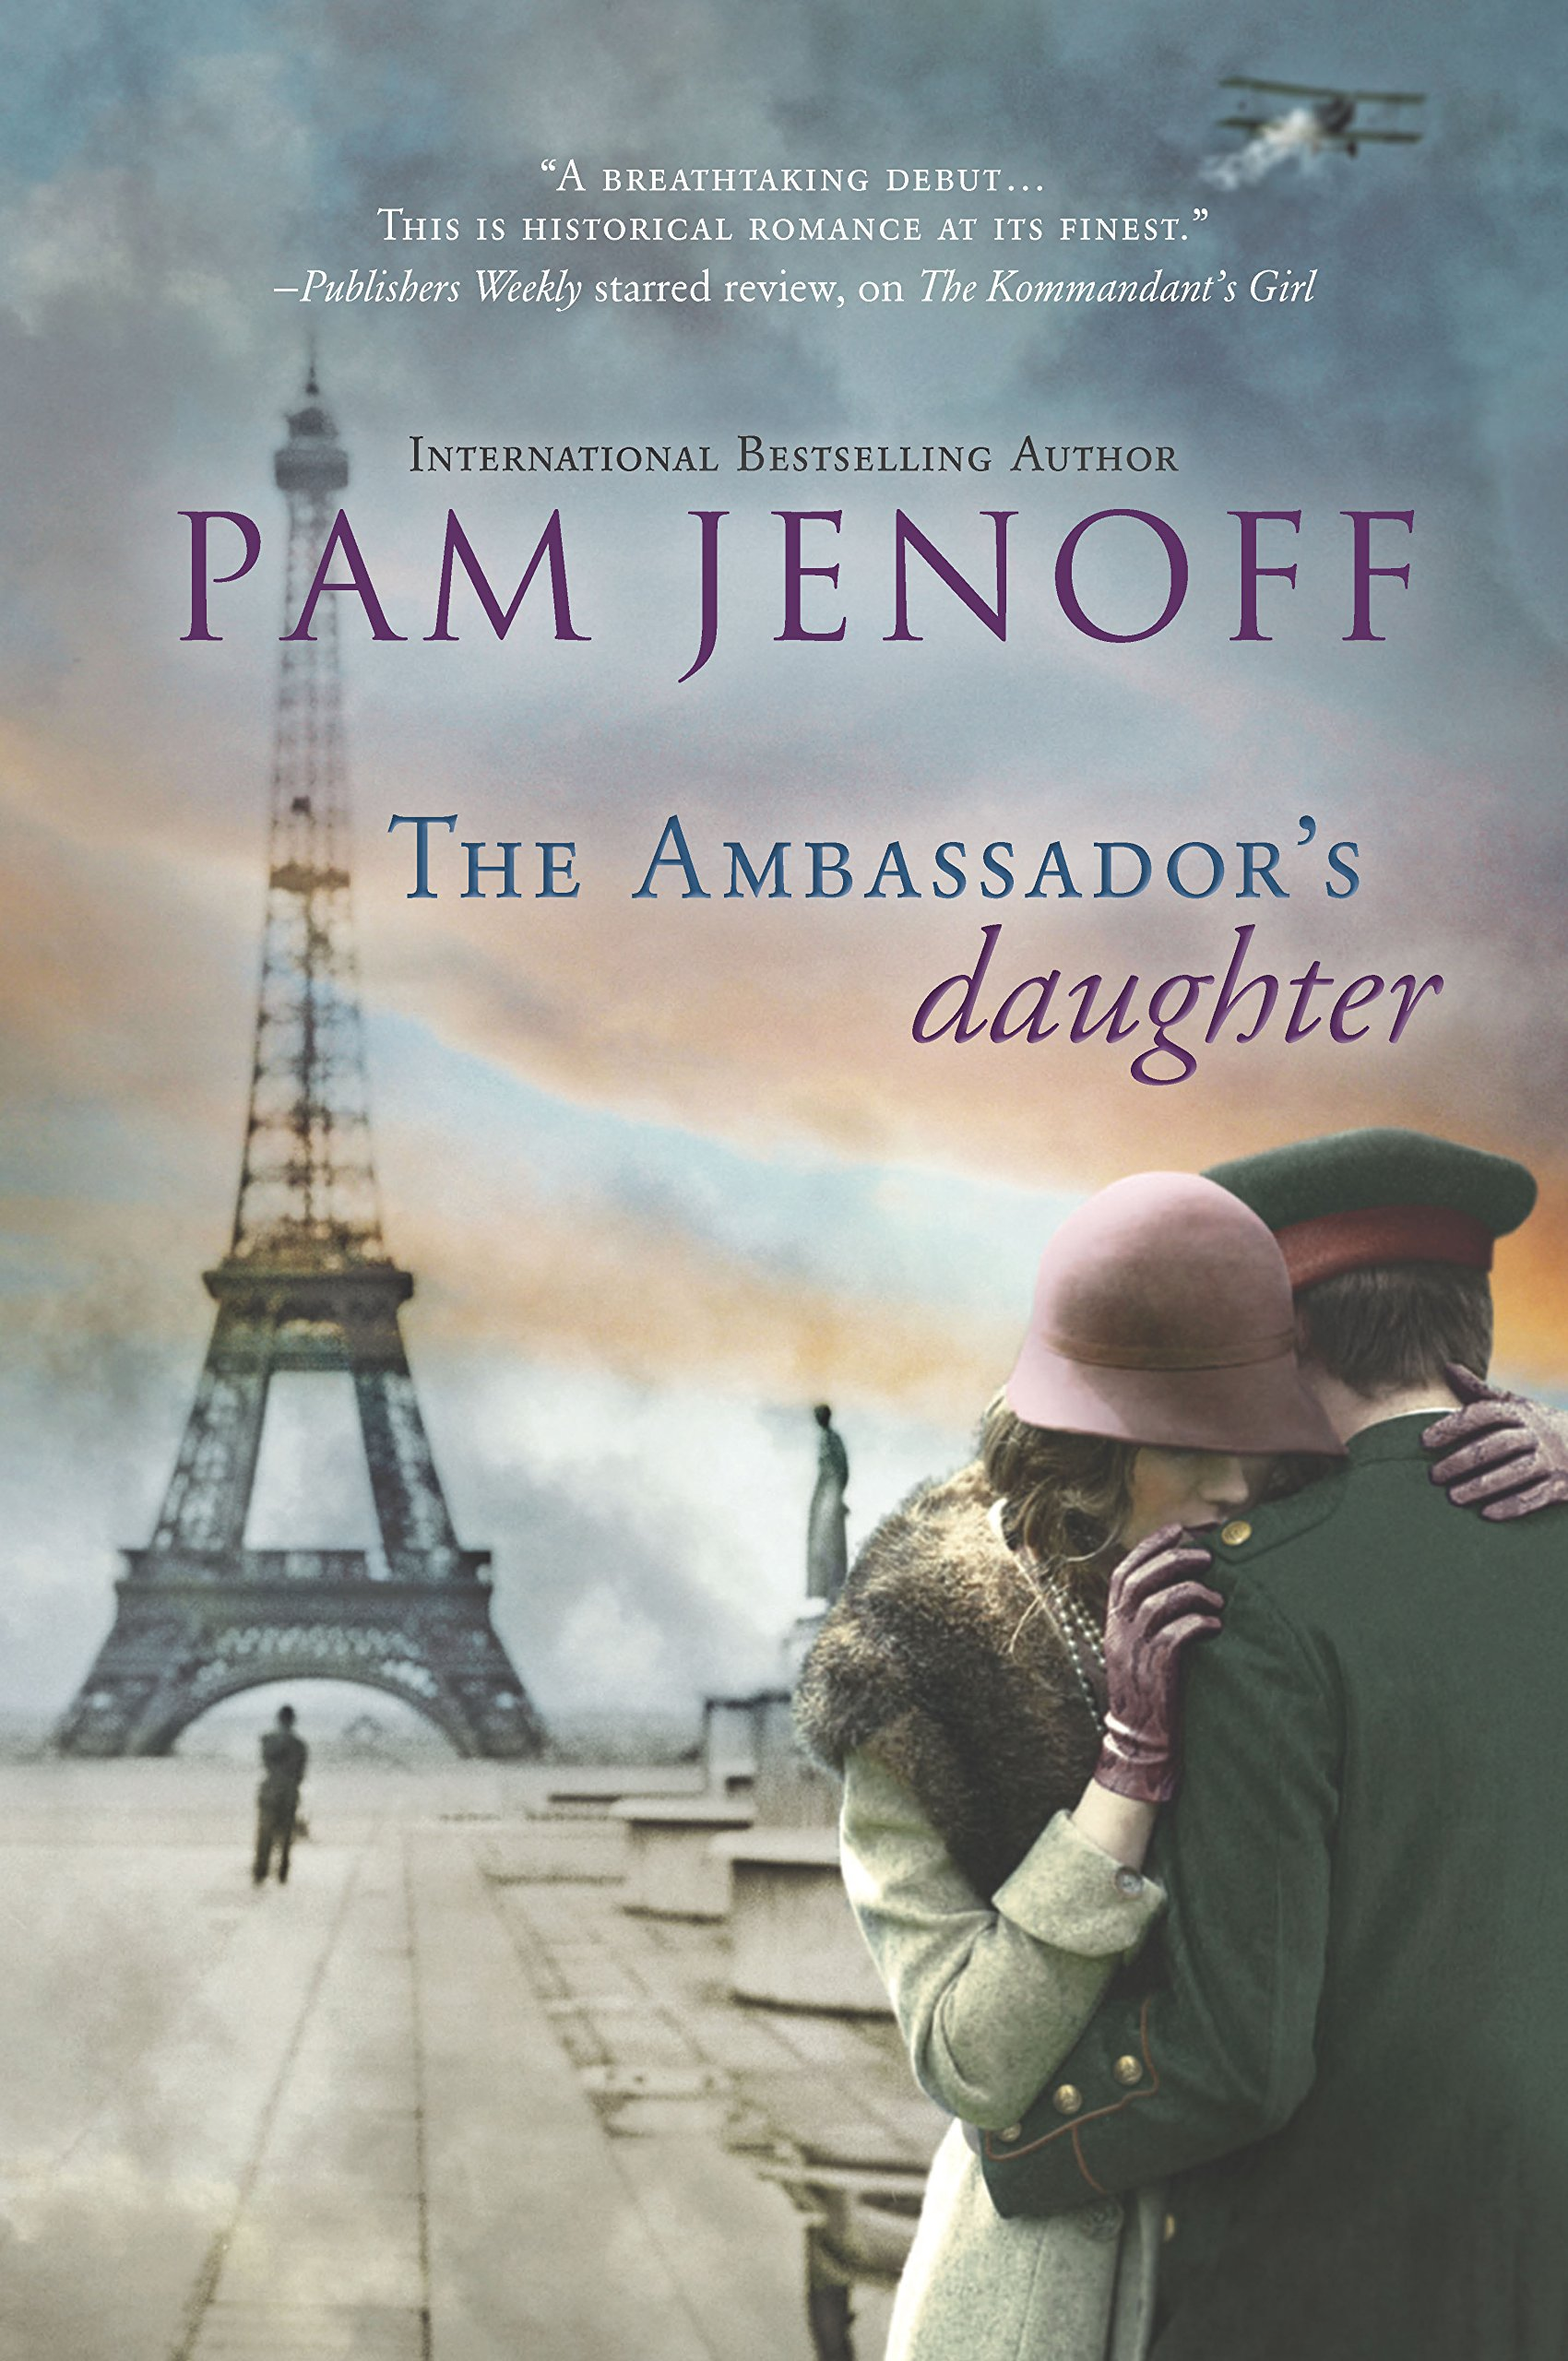 The Ambassador's Daughter (The Kommandant's Girl): Pam Jenoff:  9780778315094: Amazon.com: Books